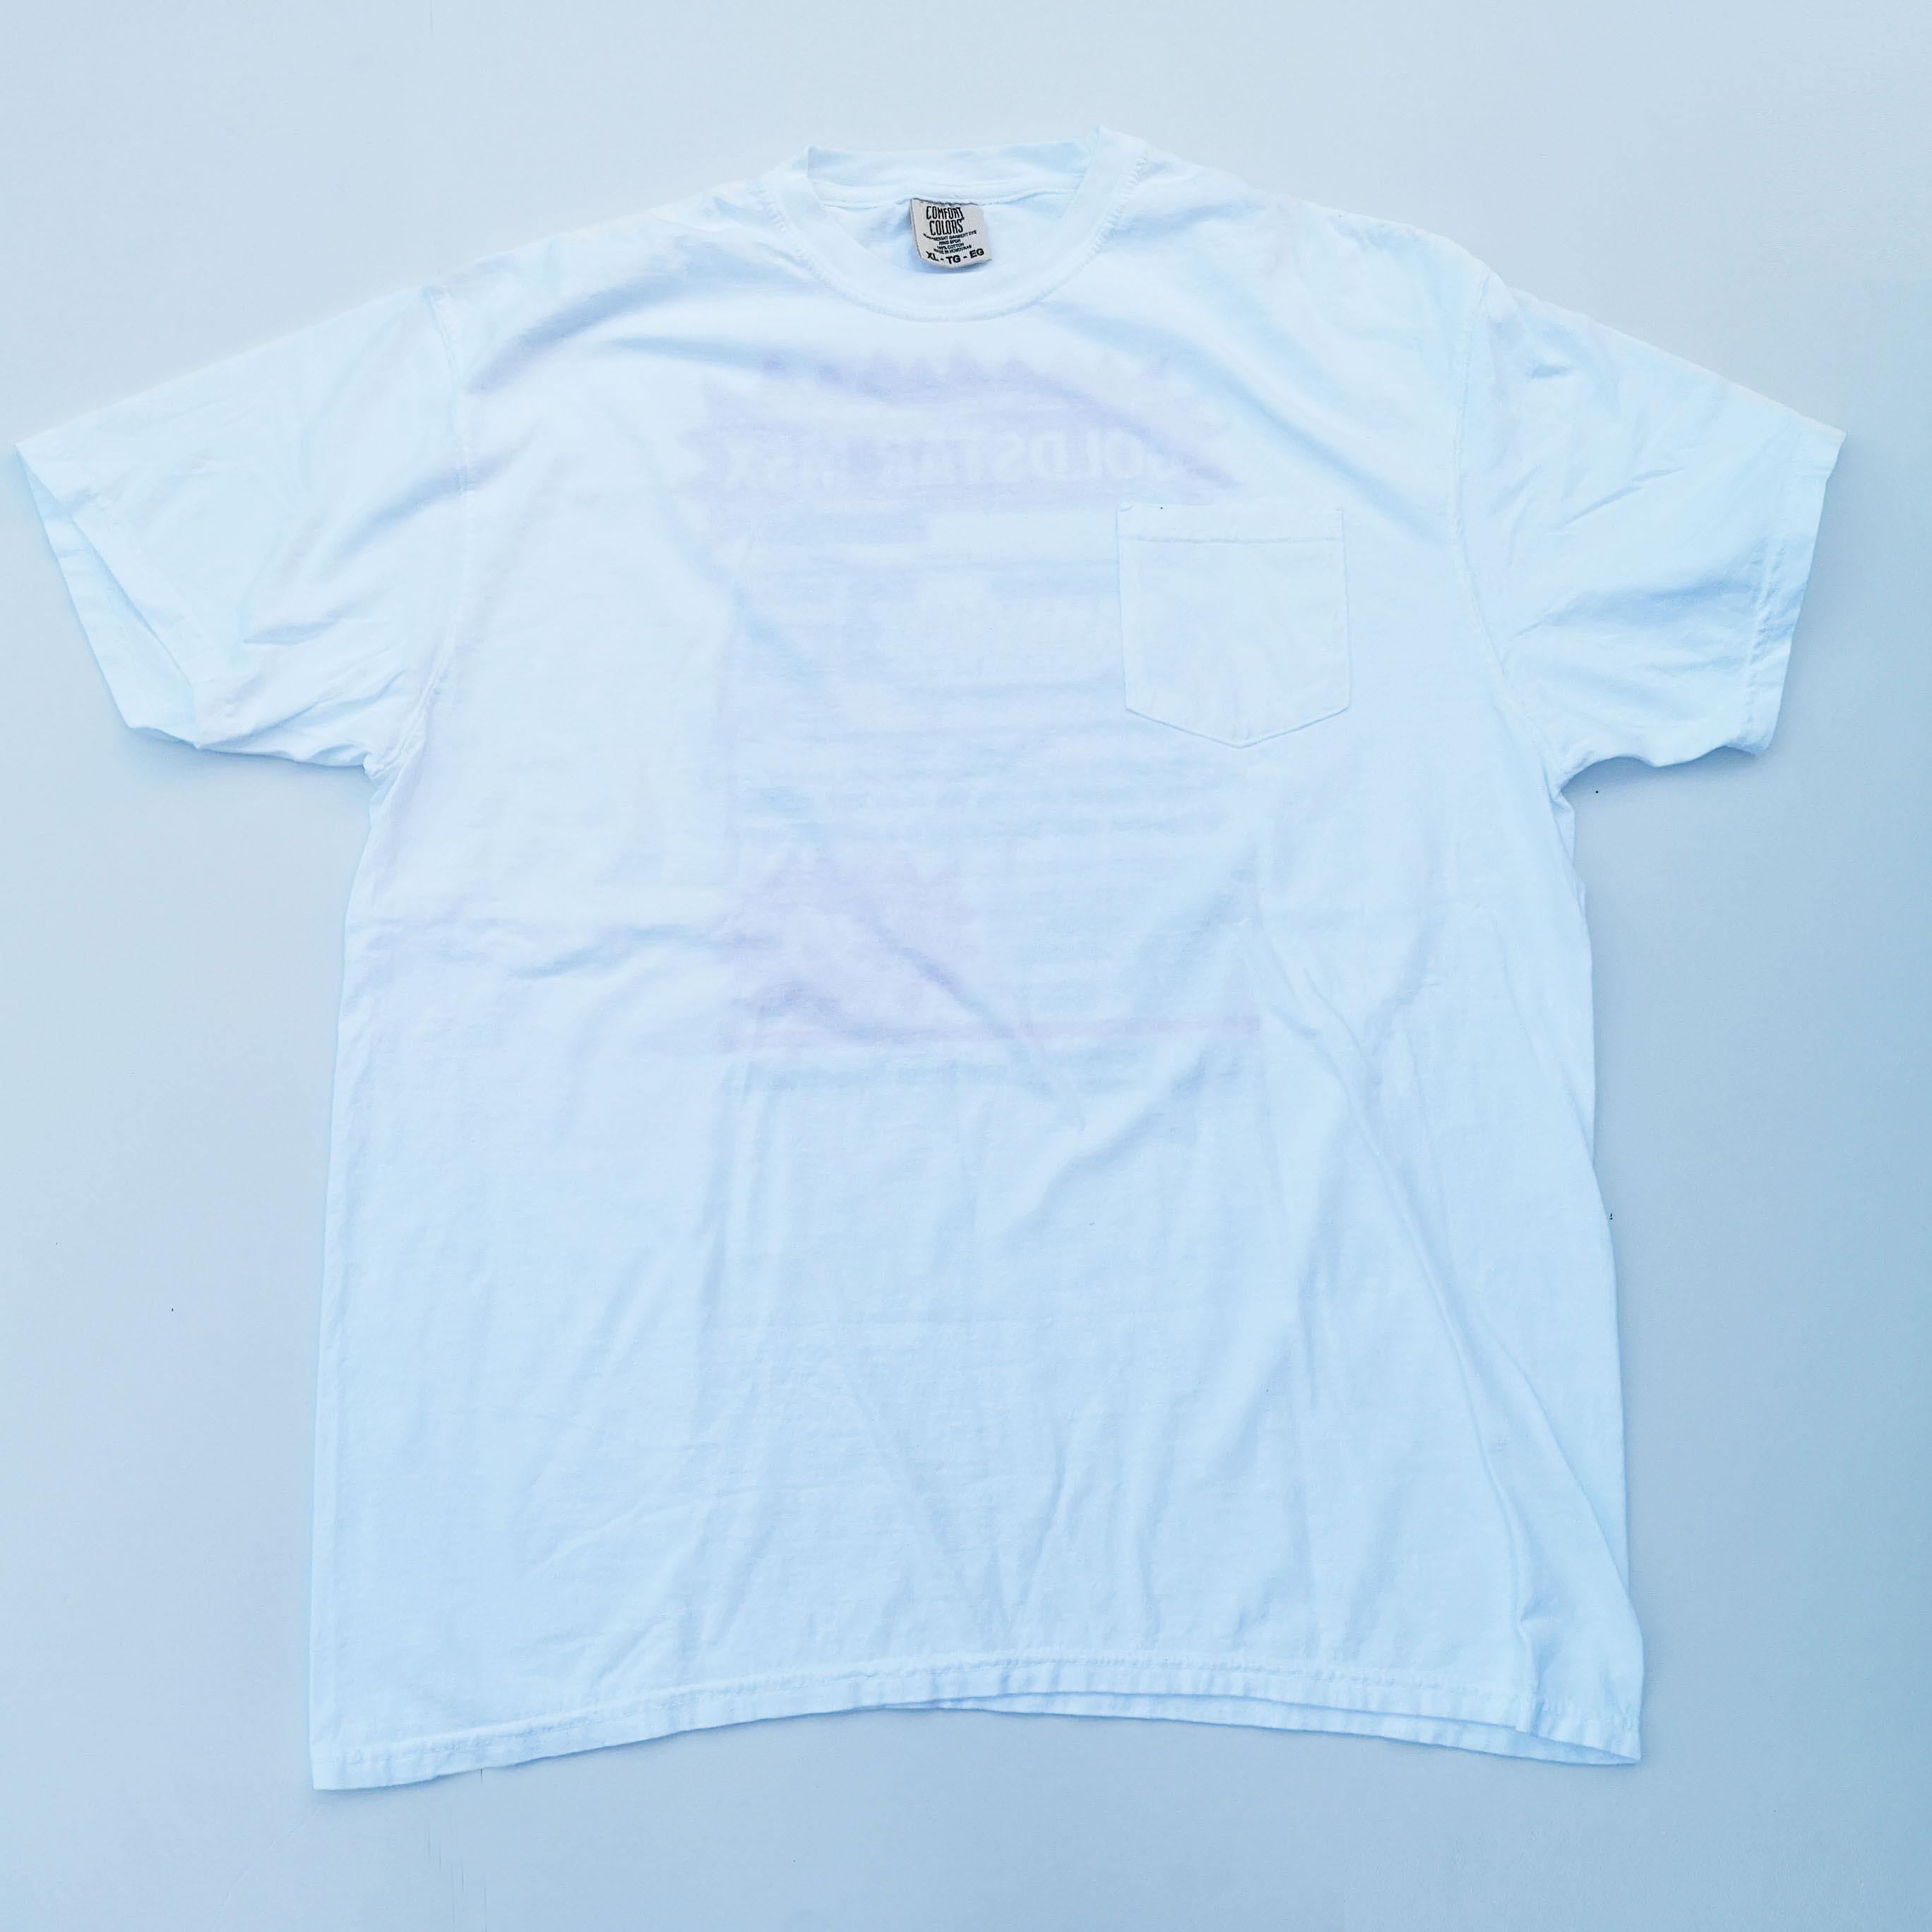 Pee Cee For Sale POCKET TEE WHITE XL -SOUVENIR PACK-